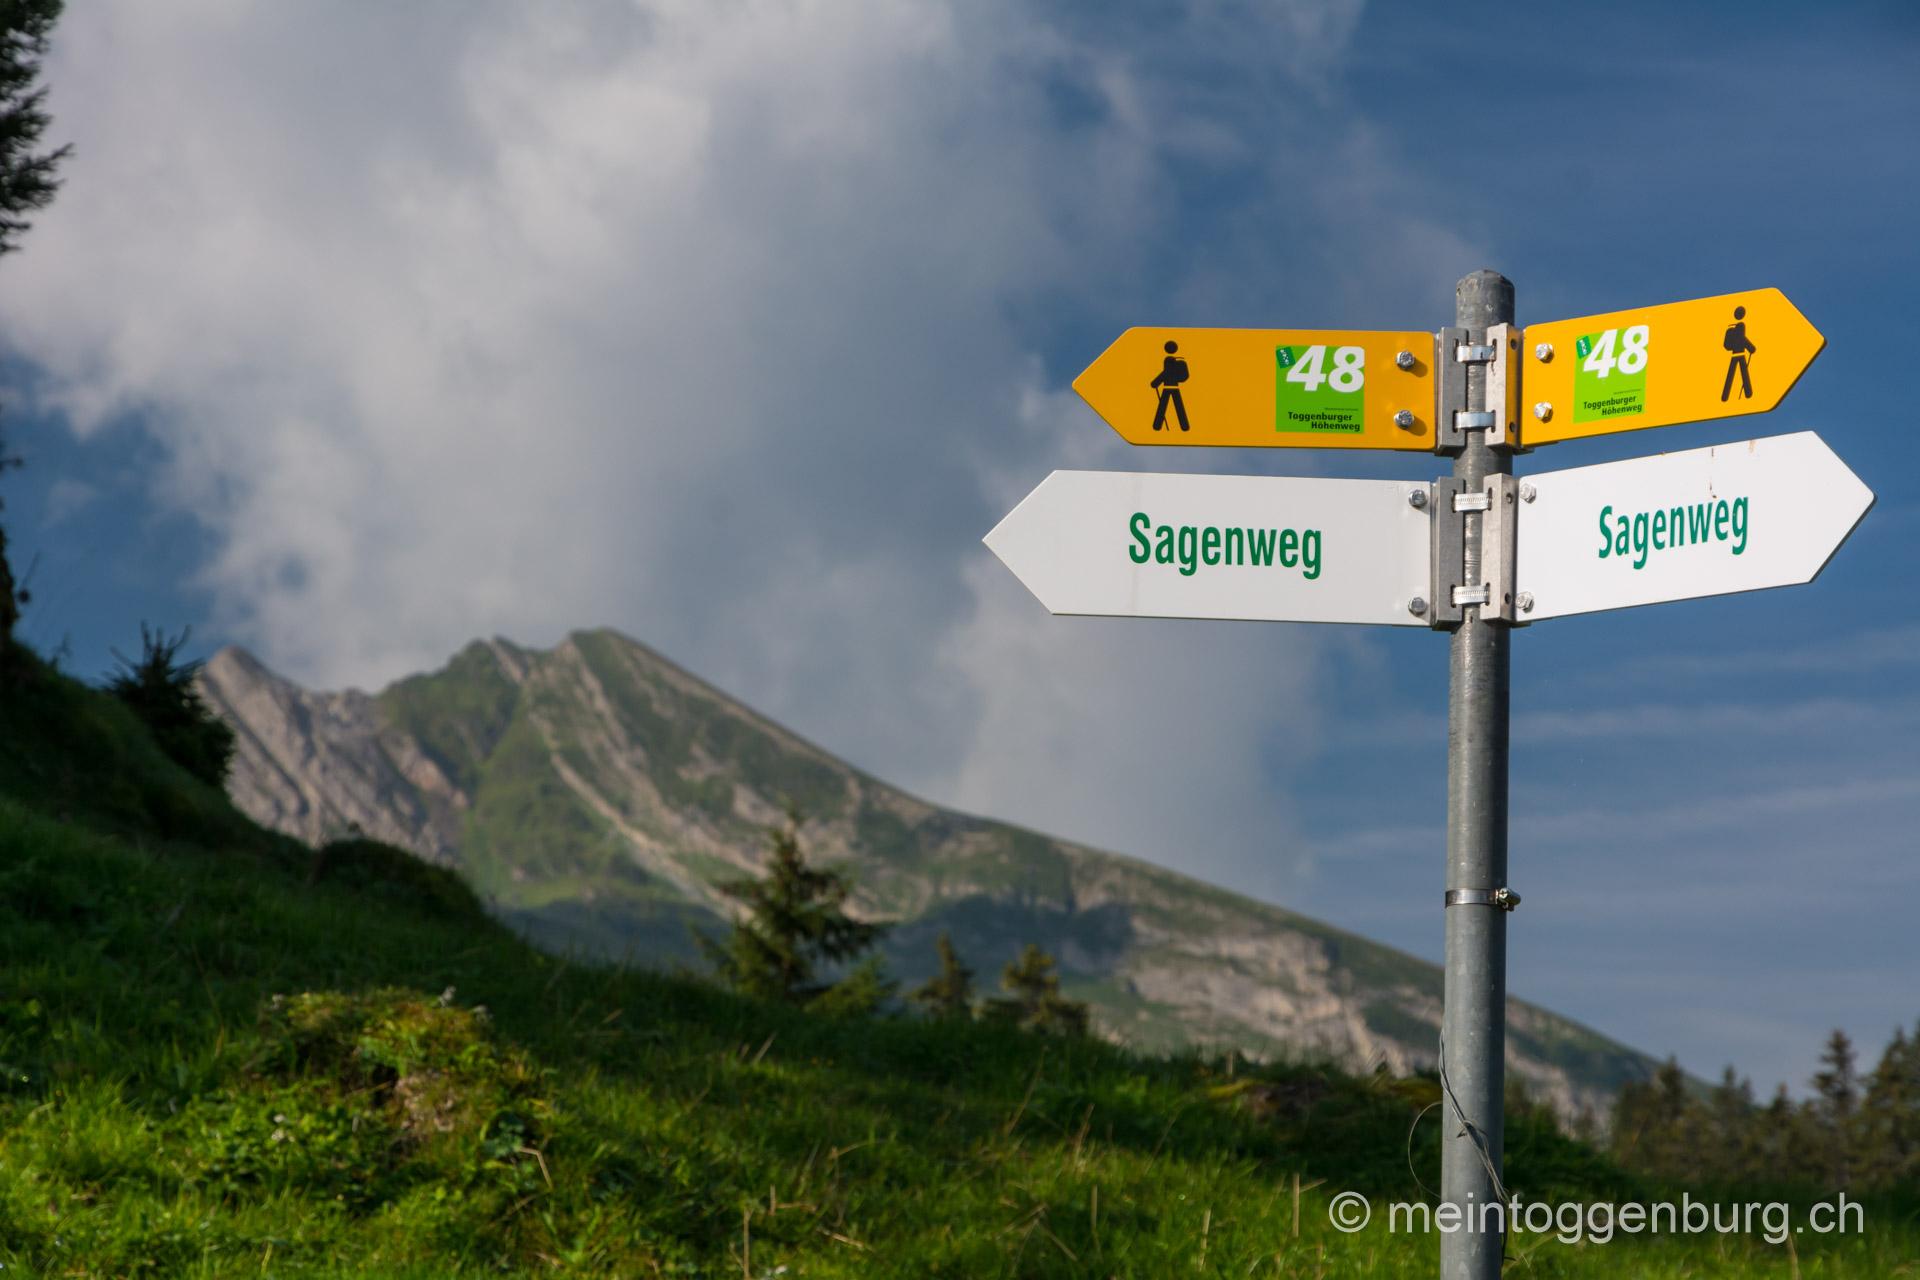 Toggenburger Sagenweg